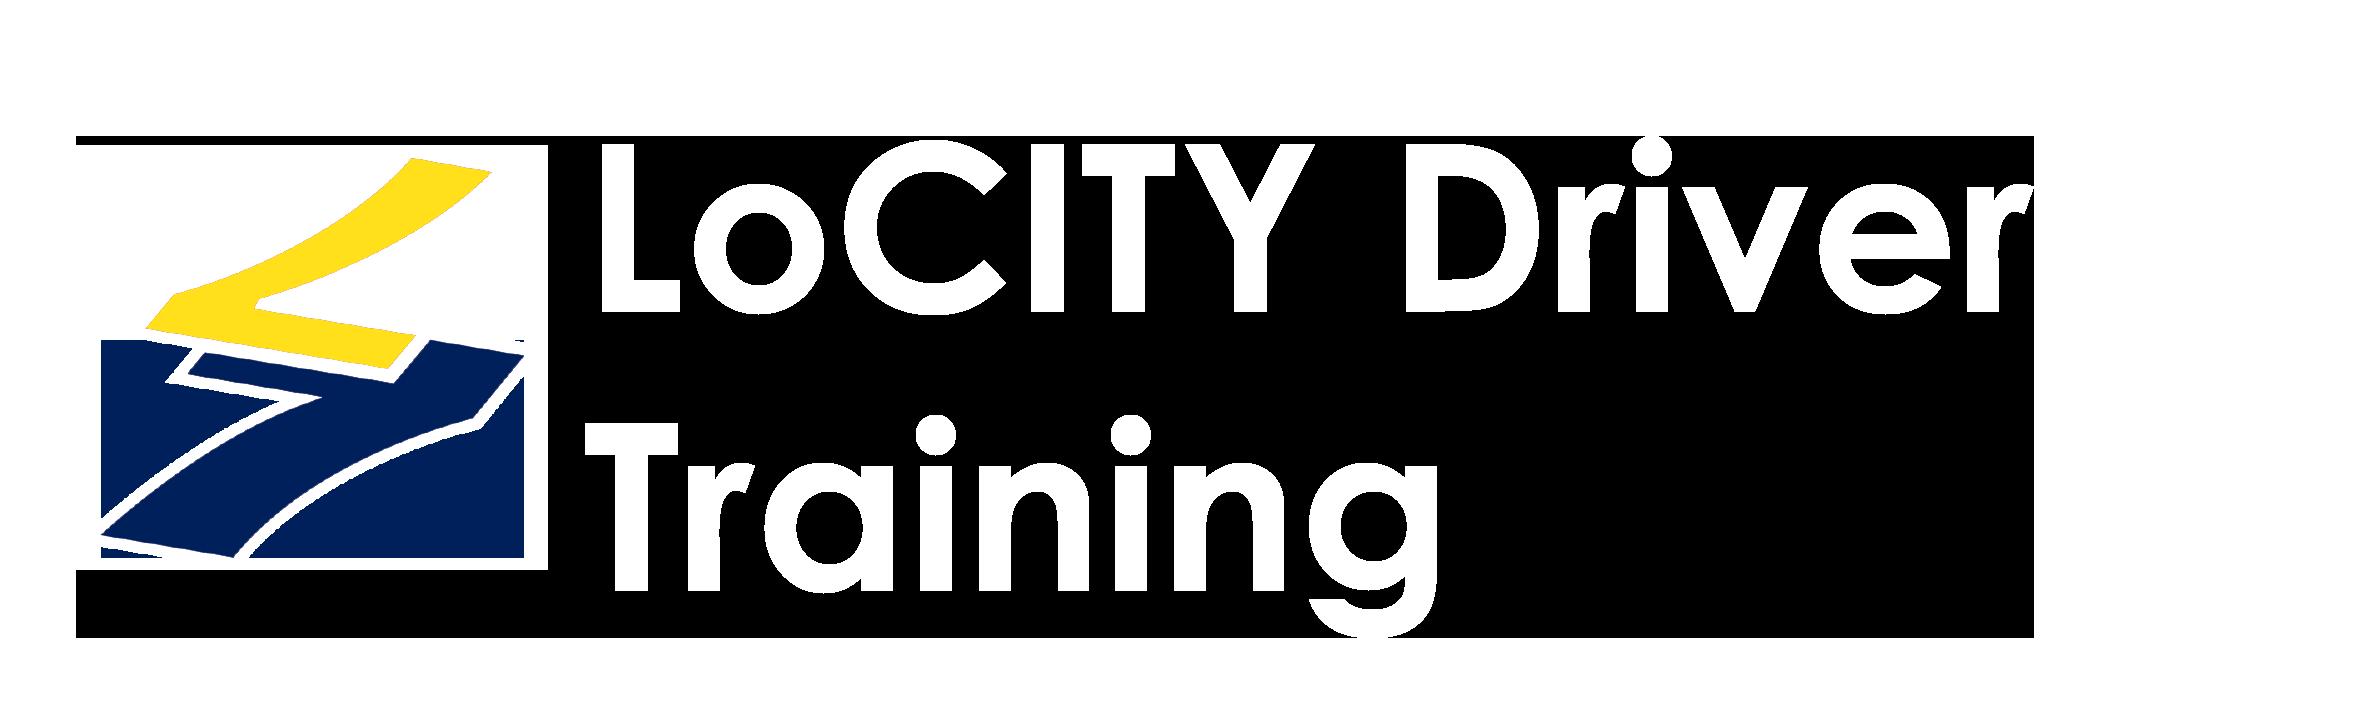 LoCity Driver Training